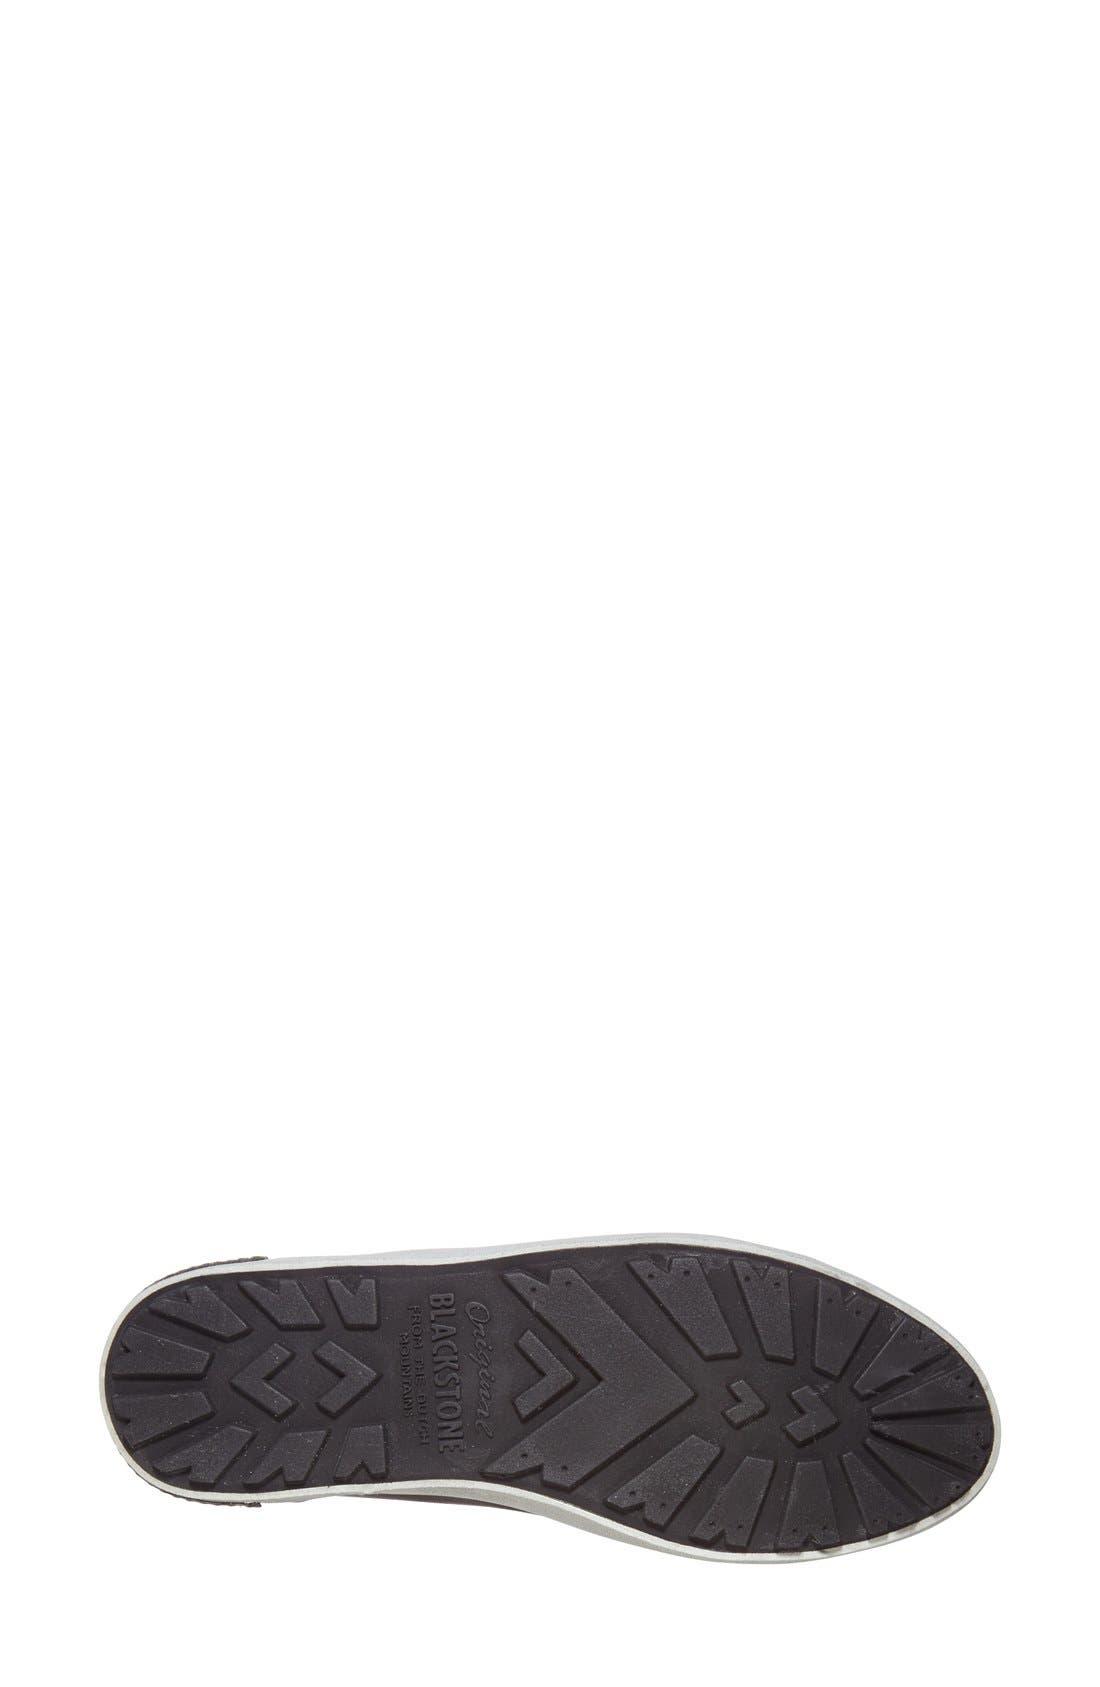 'JL24' Sneaker,                             Alternate thumbnail 4, color,                             CHARCOAL